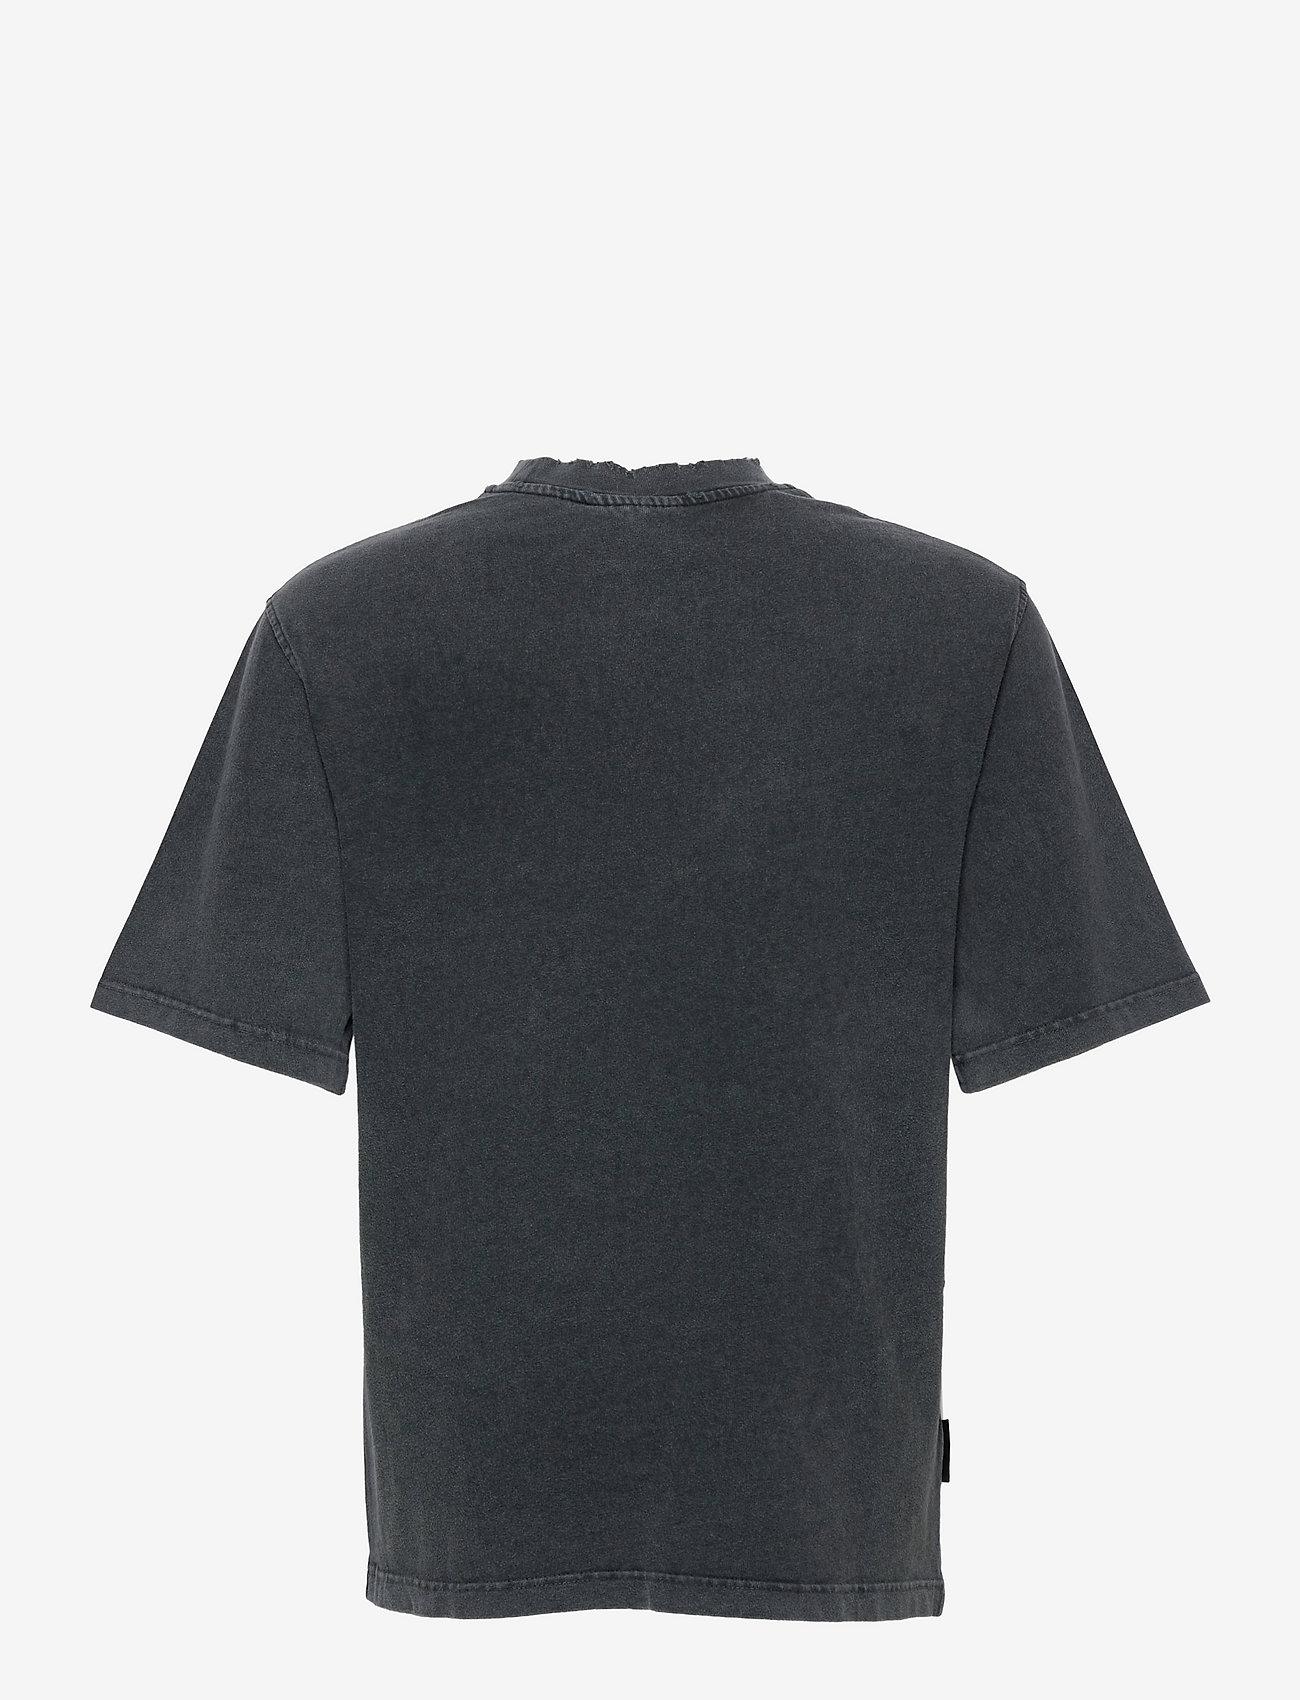 HAN Kjøbenhavn - Distressed Tee Short Sleeve - basic t-shirts - distressed dark grey - 1